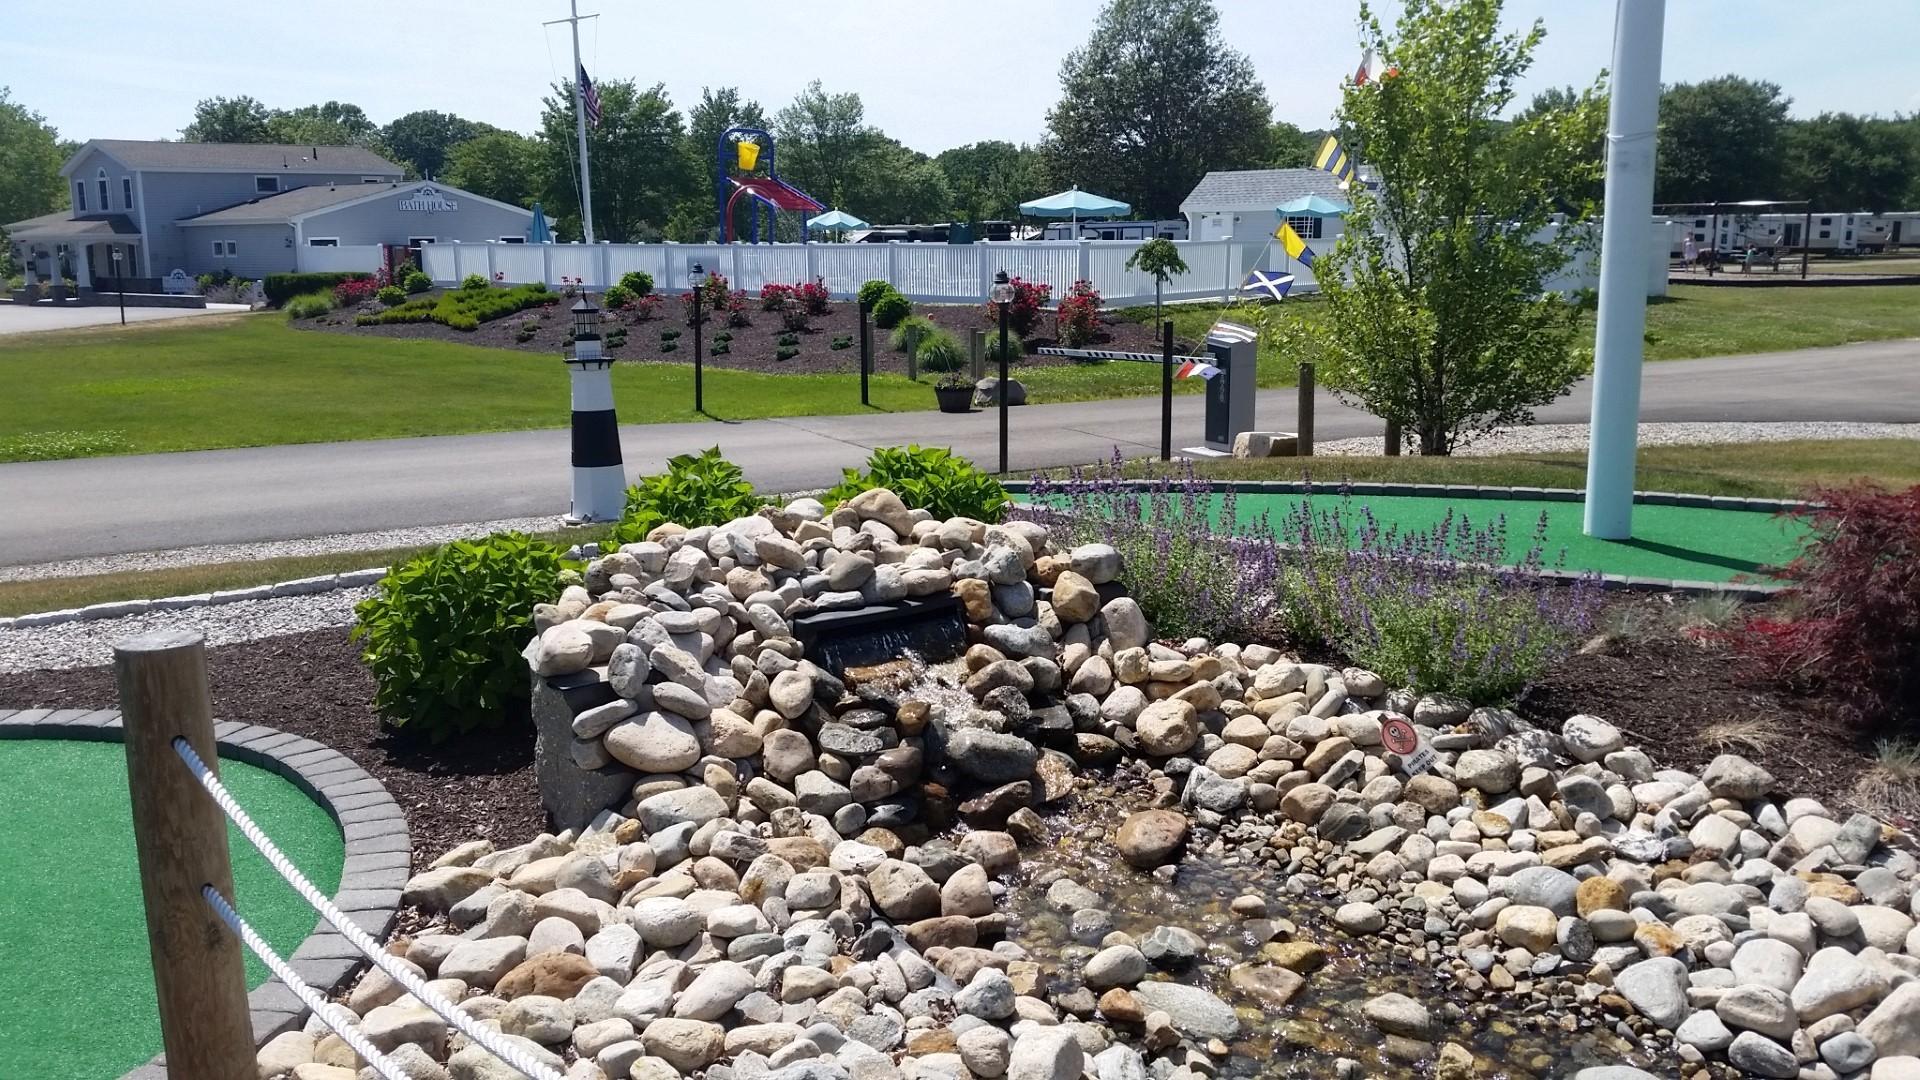 06 29 16 Seaport Rv Resort In Connecticut Saddleback